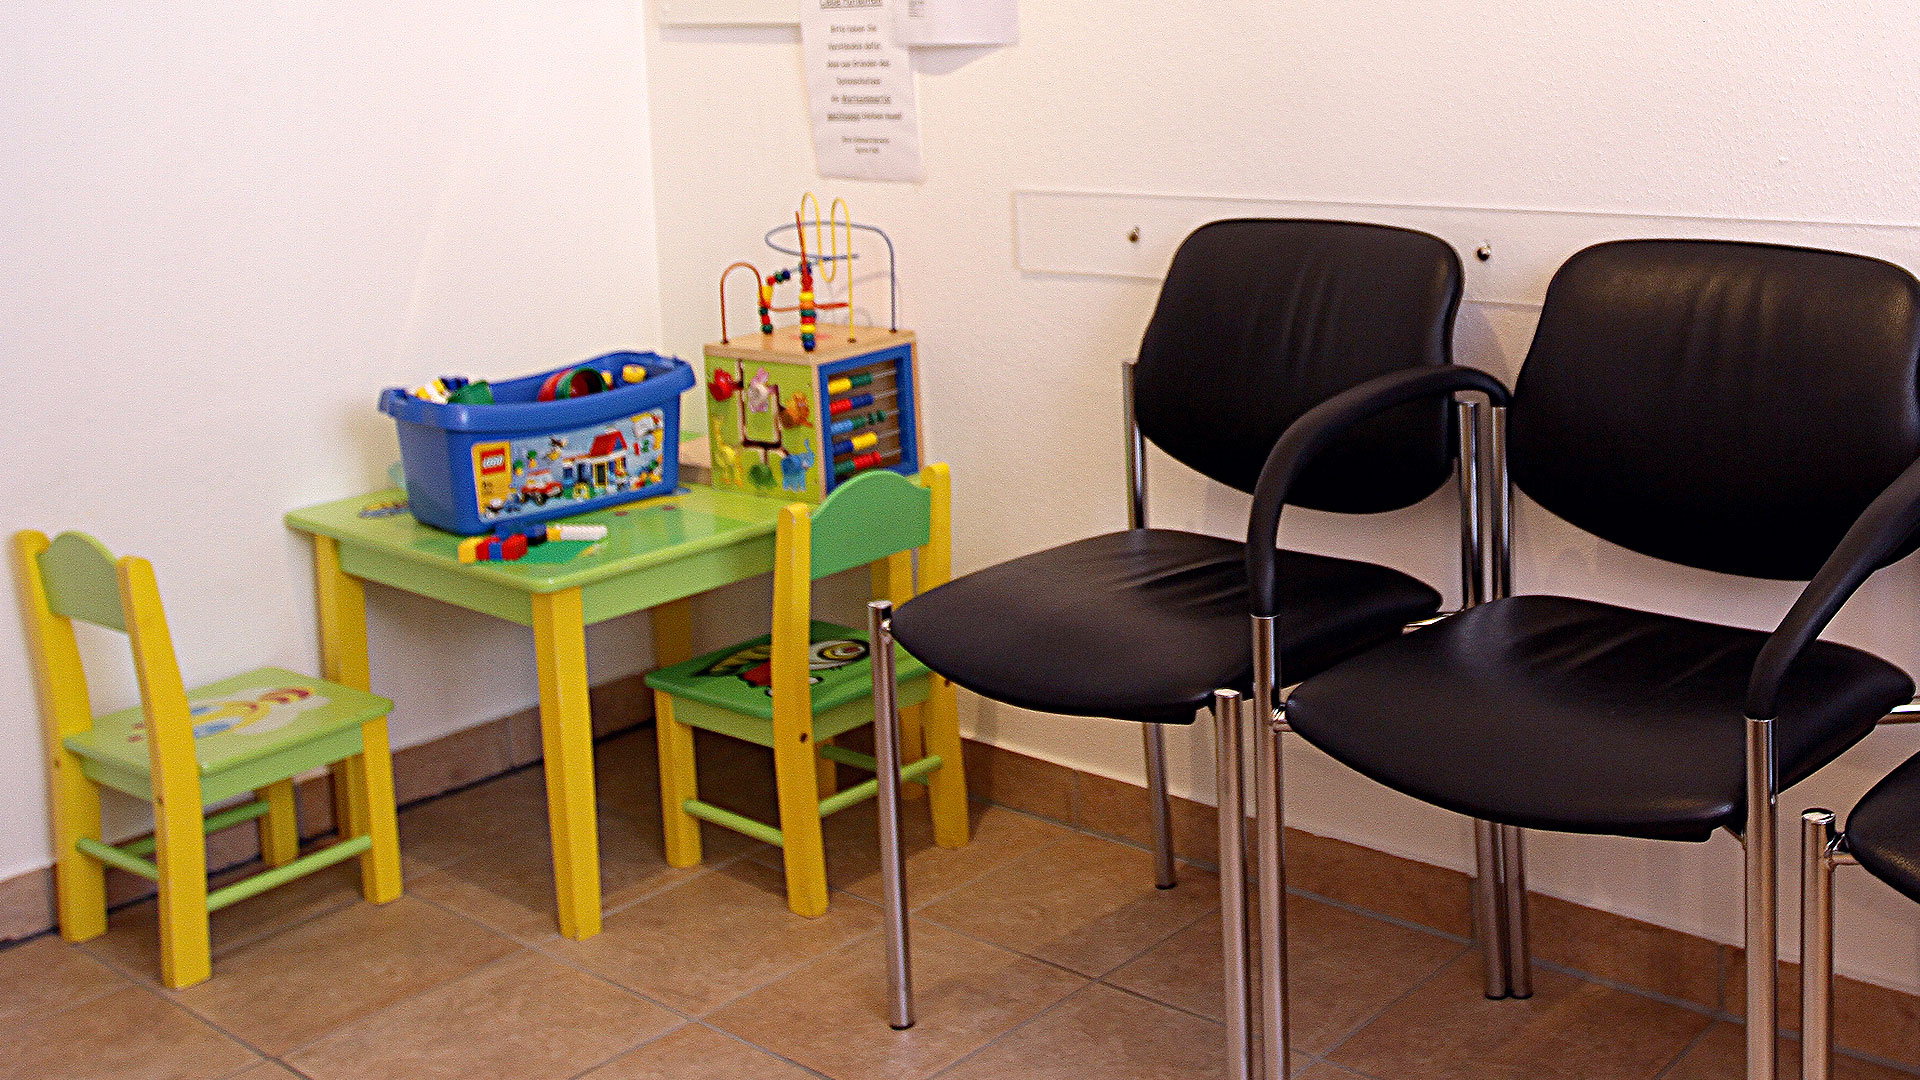 Zahnarztpraxis Sylvia Pahl Wartezimmer